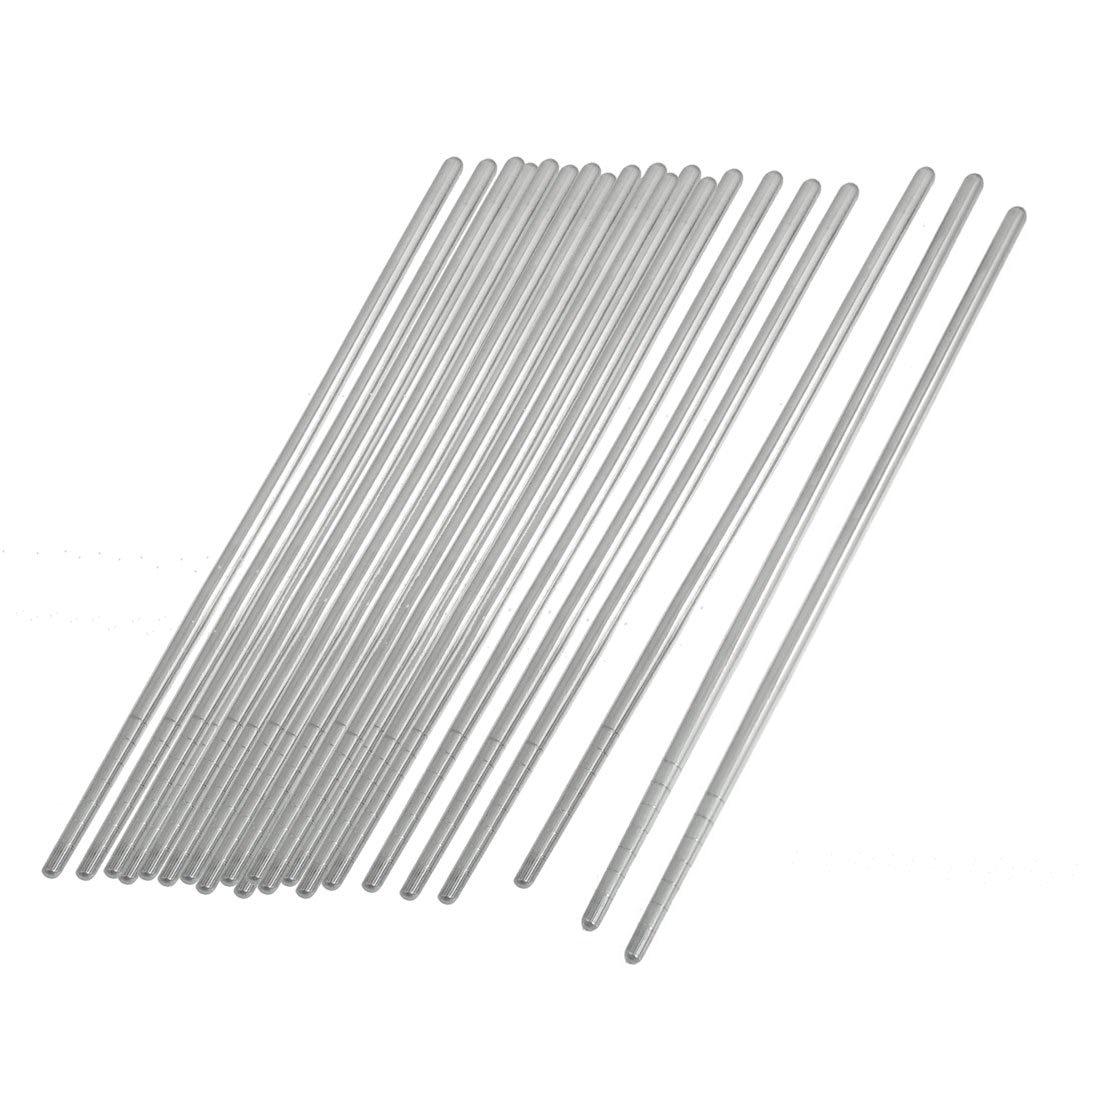 Aliexpress Buy 10 Pair 8 9 Silver Tone Stainless Steel Tapered Slight Design Tableware